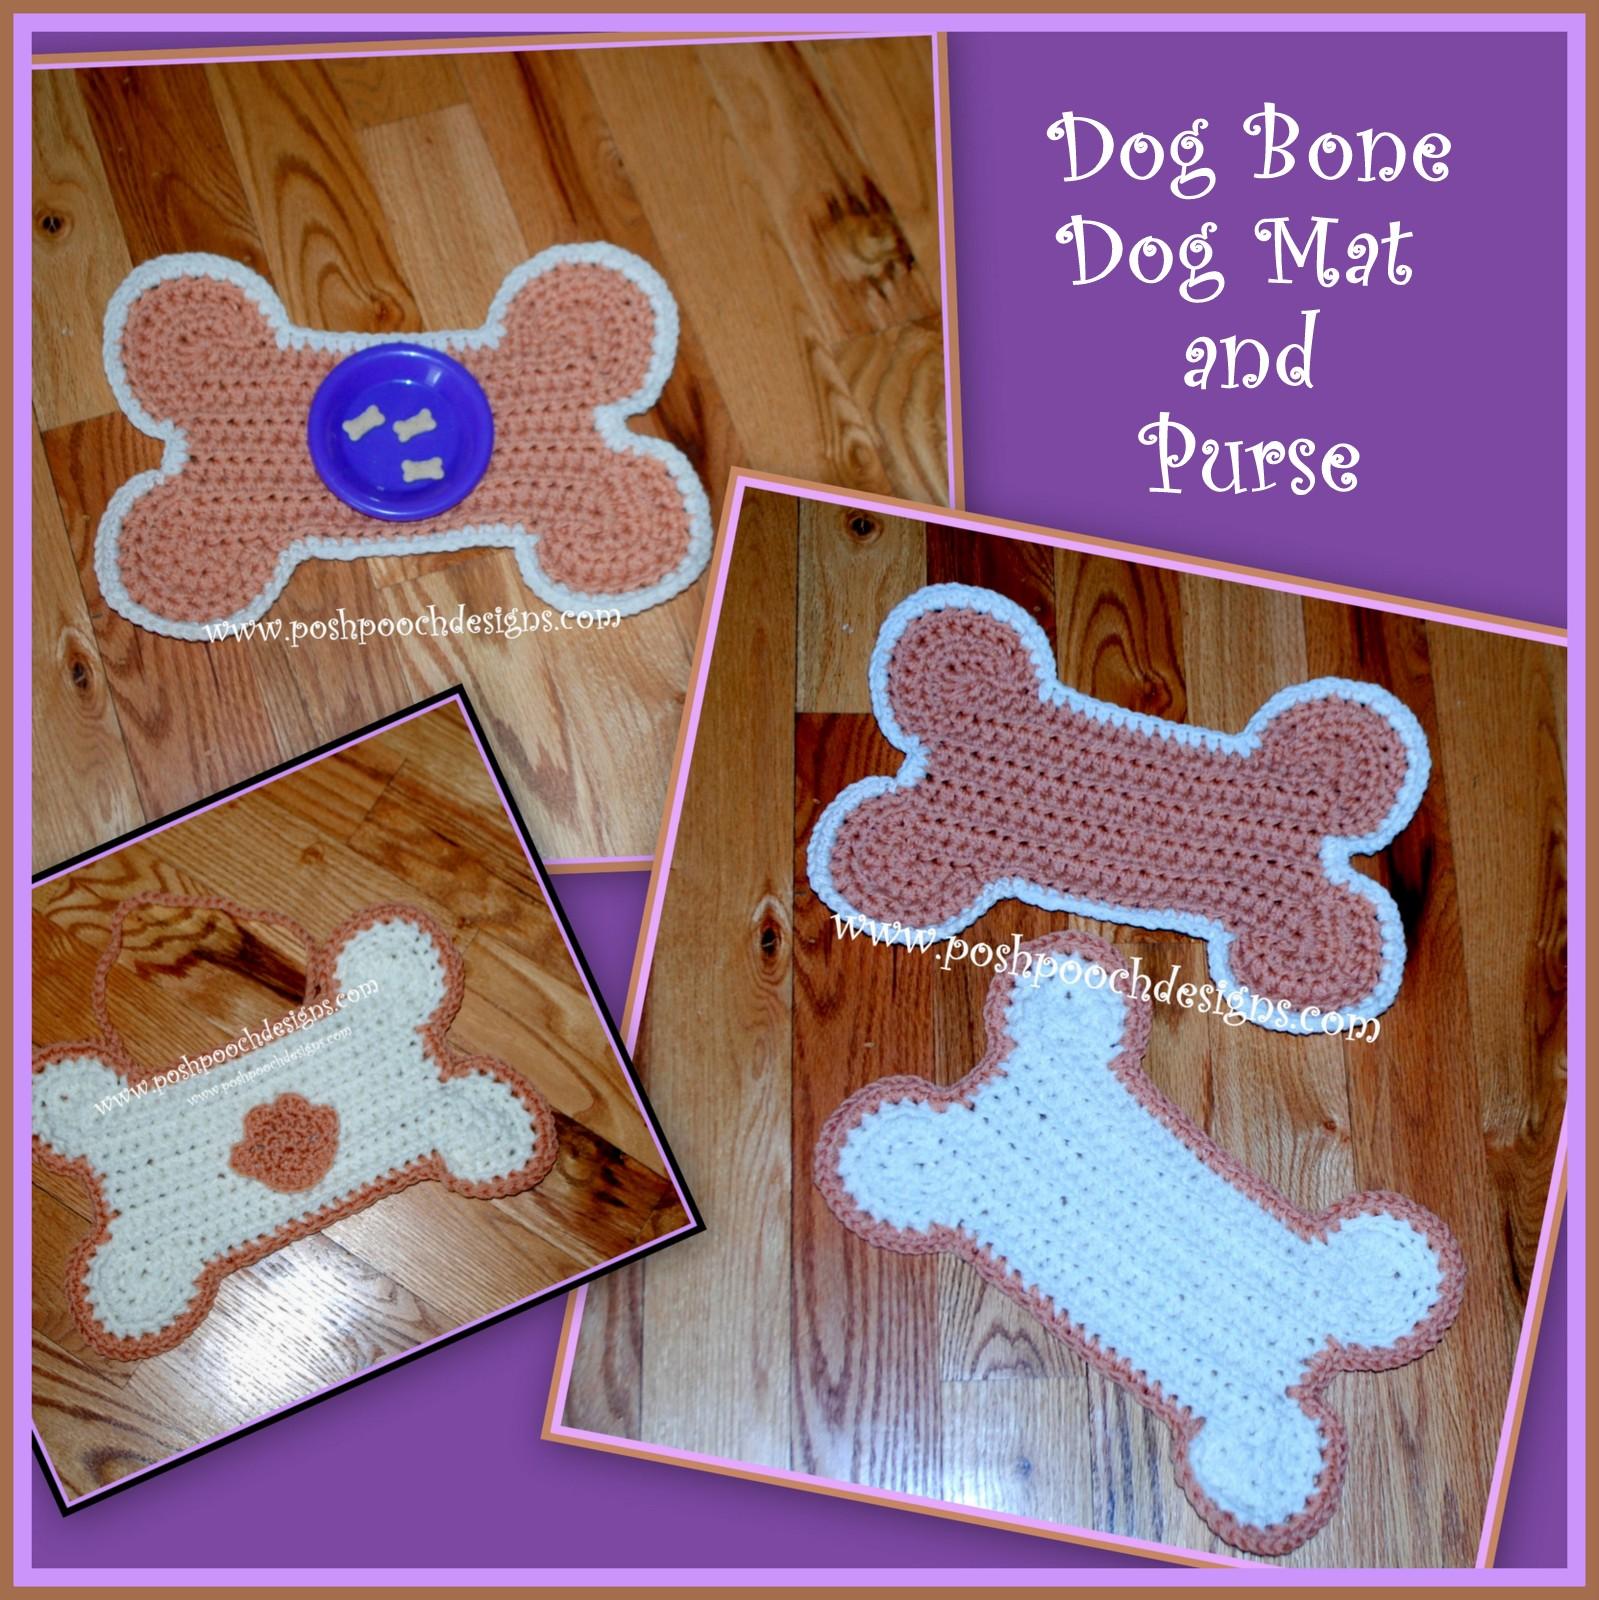 Posh Pooch Designs Dog Clothes: Dog Bone Mat and Poo Bag ...